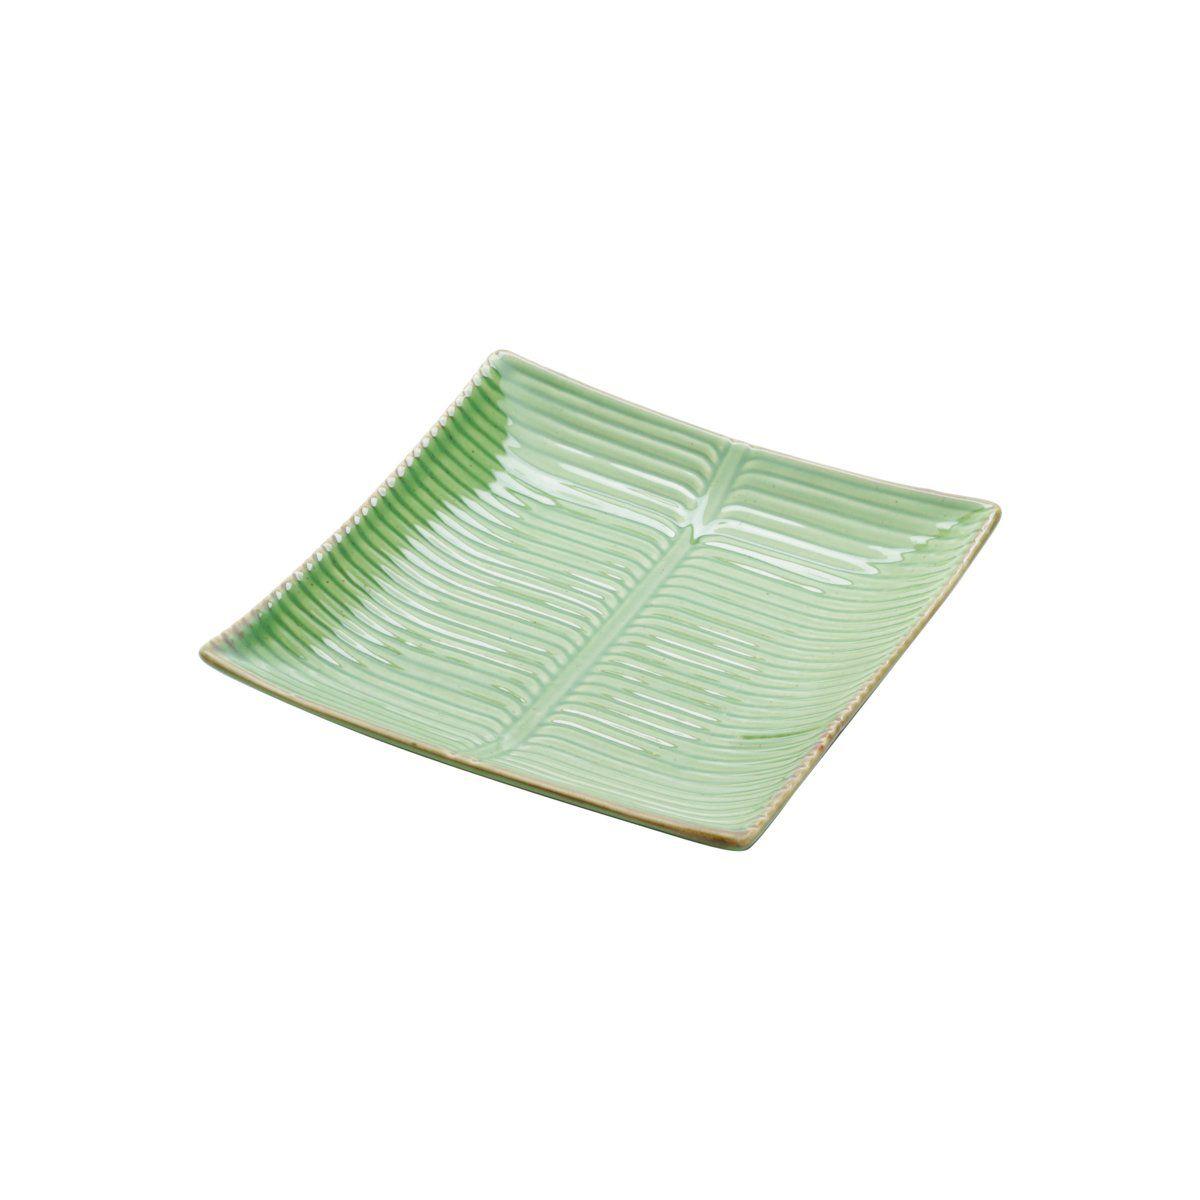 Prato decorativo 16,5 x 16,5 cm de cerâmica verde Banana Leaf Lyor - L4130